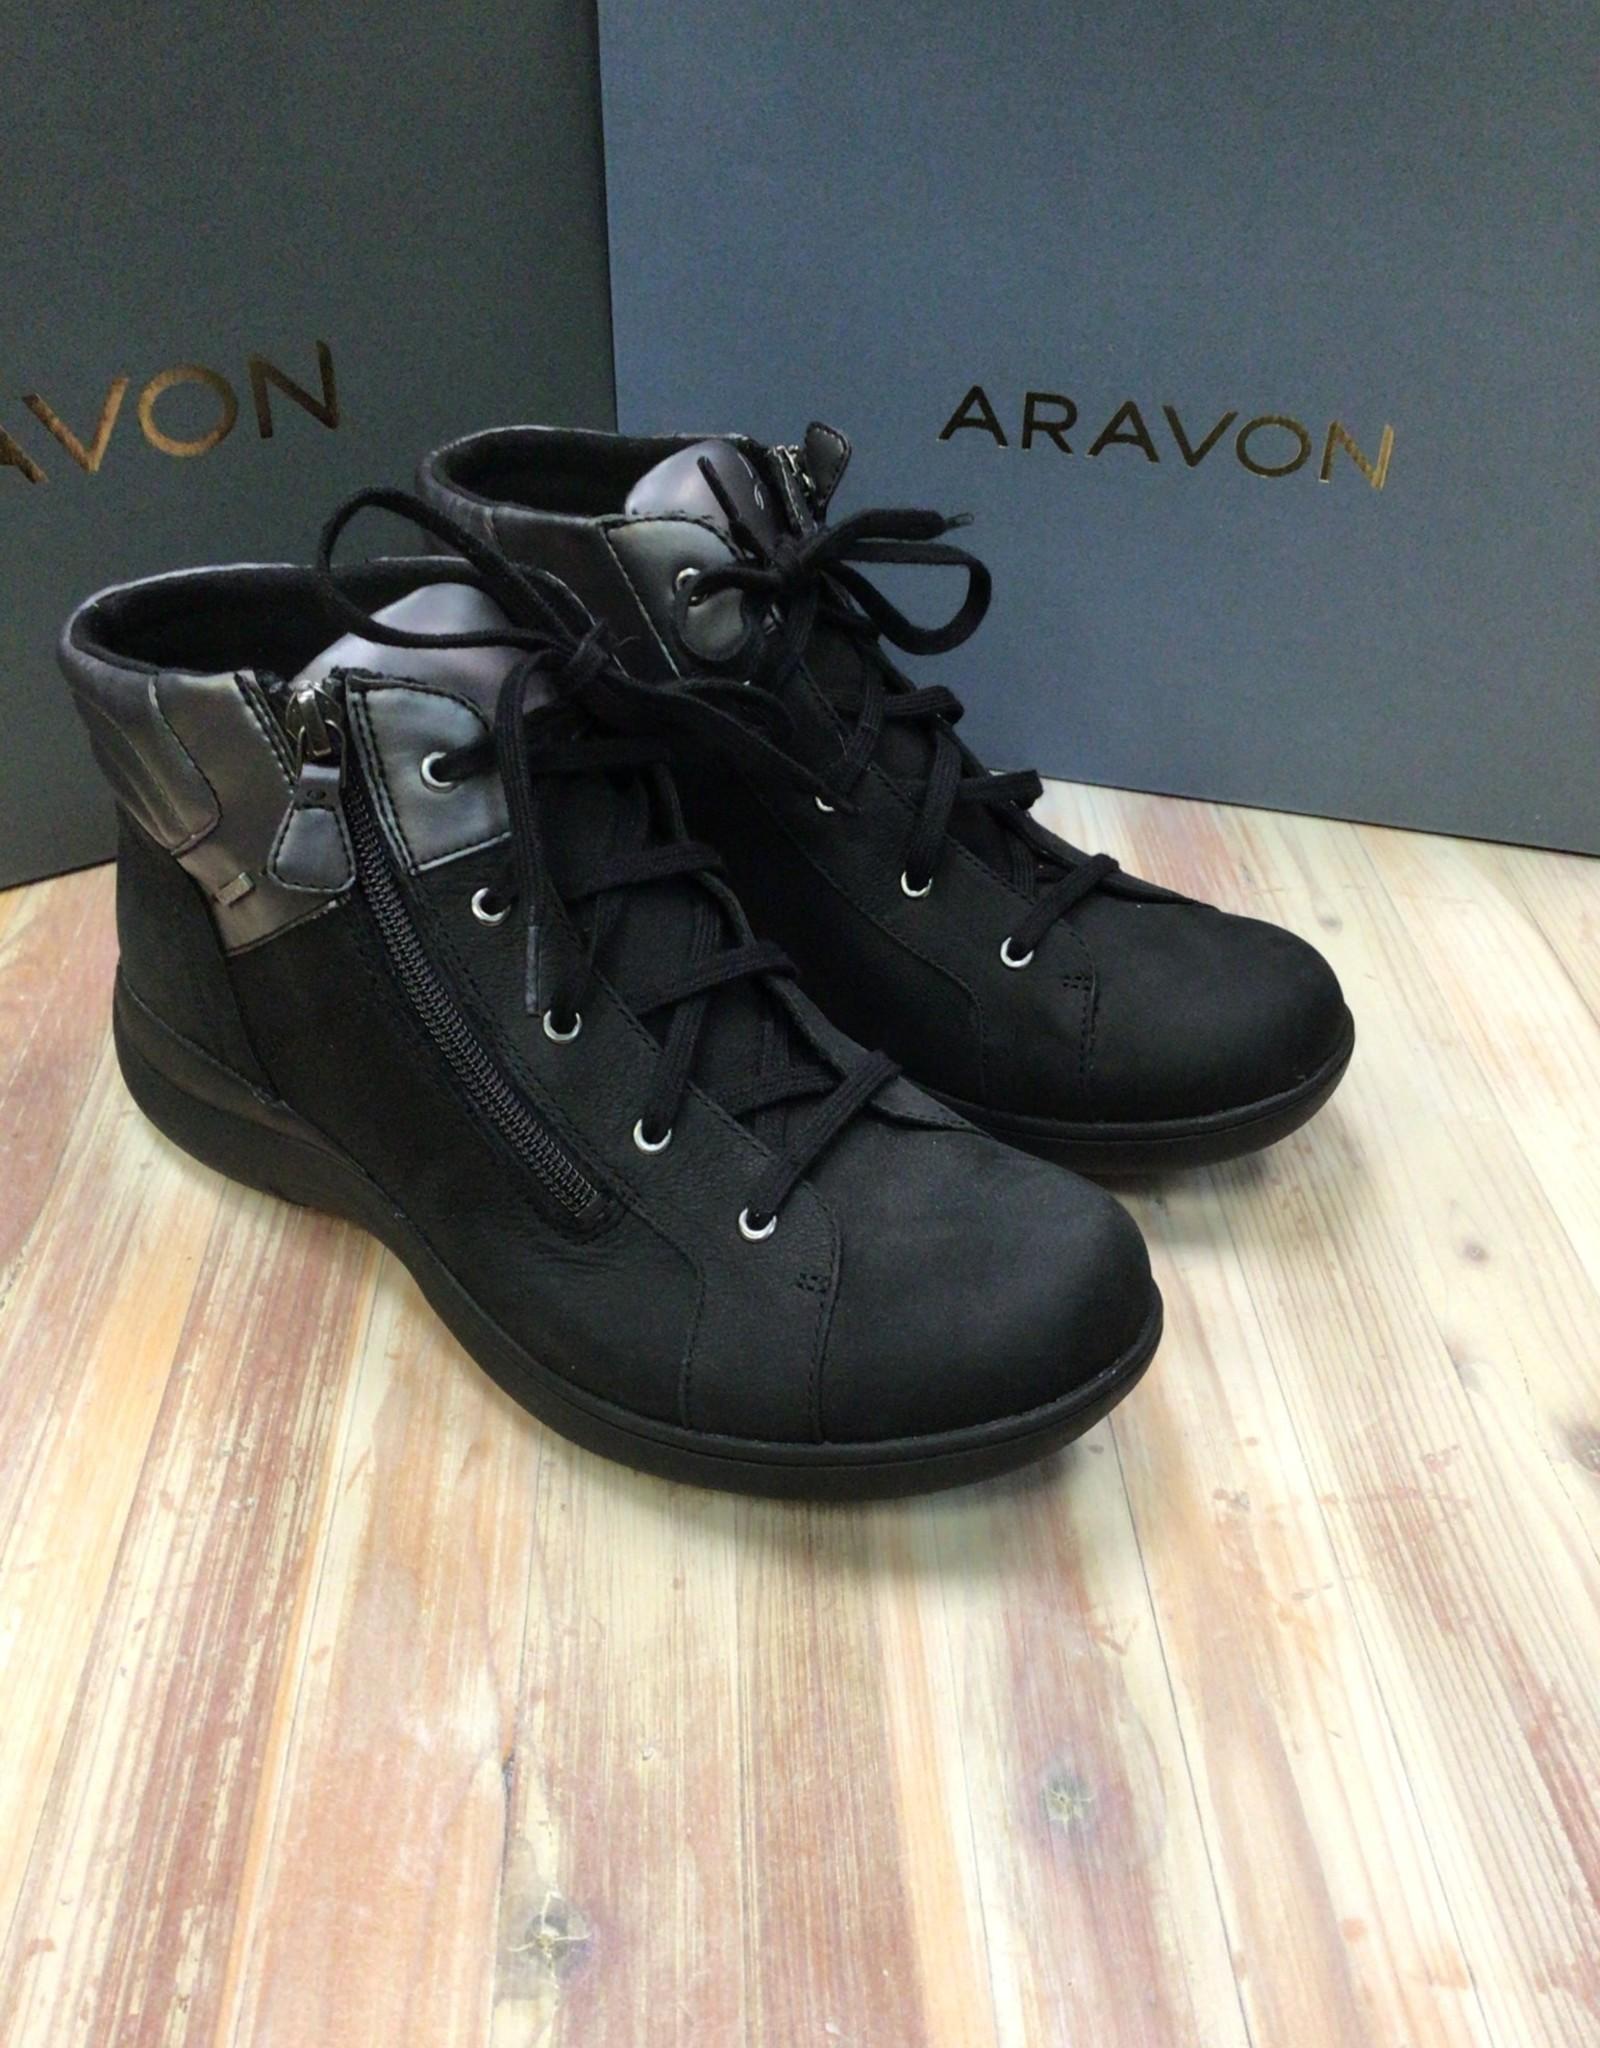 Aravon Aravon RS WP Low Boot Ladies'